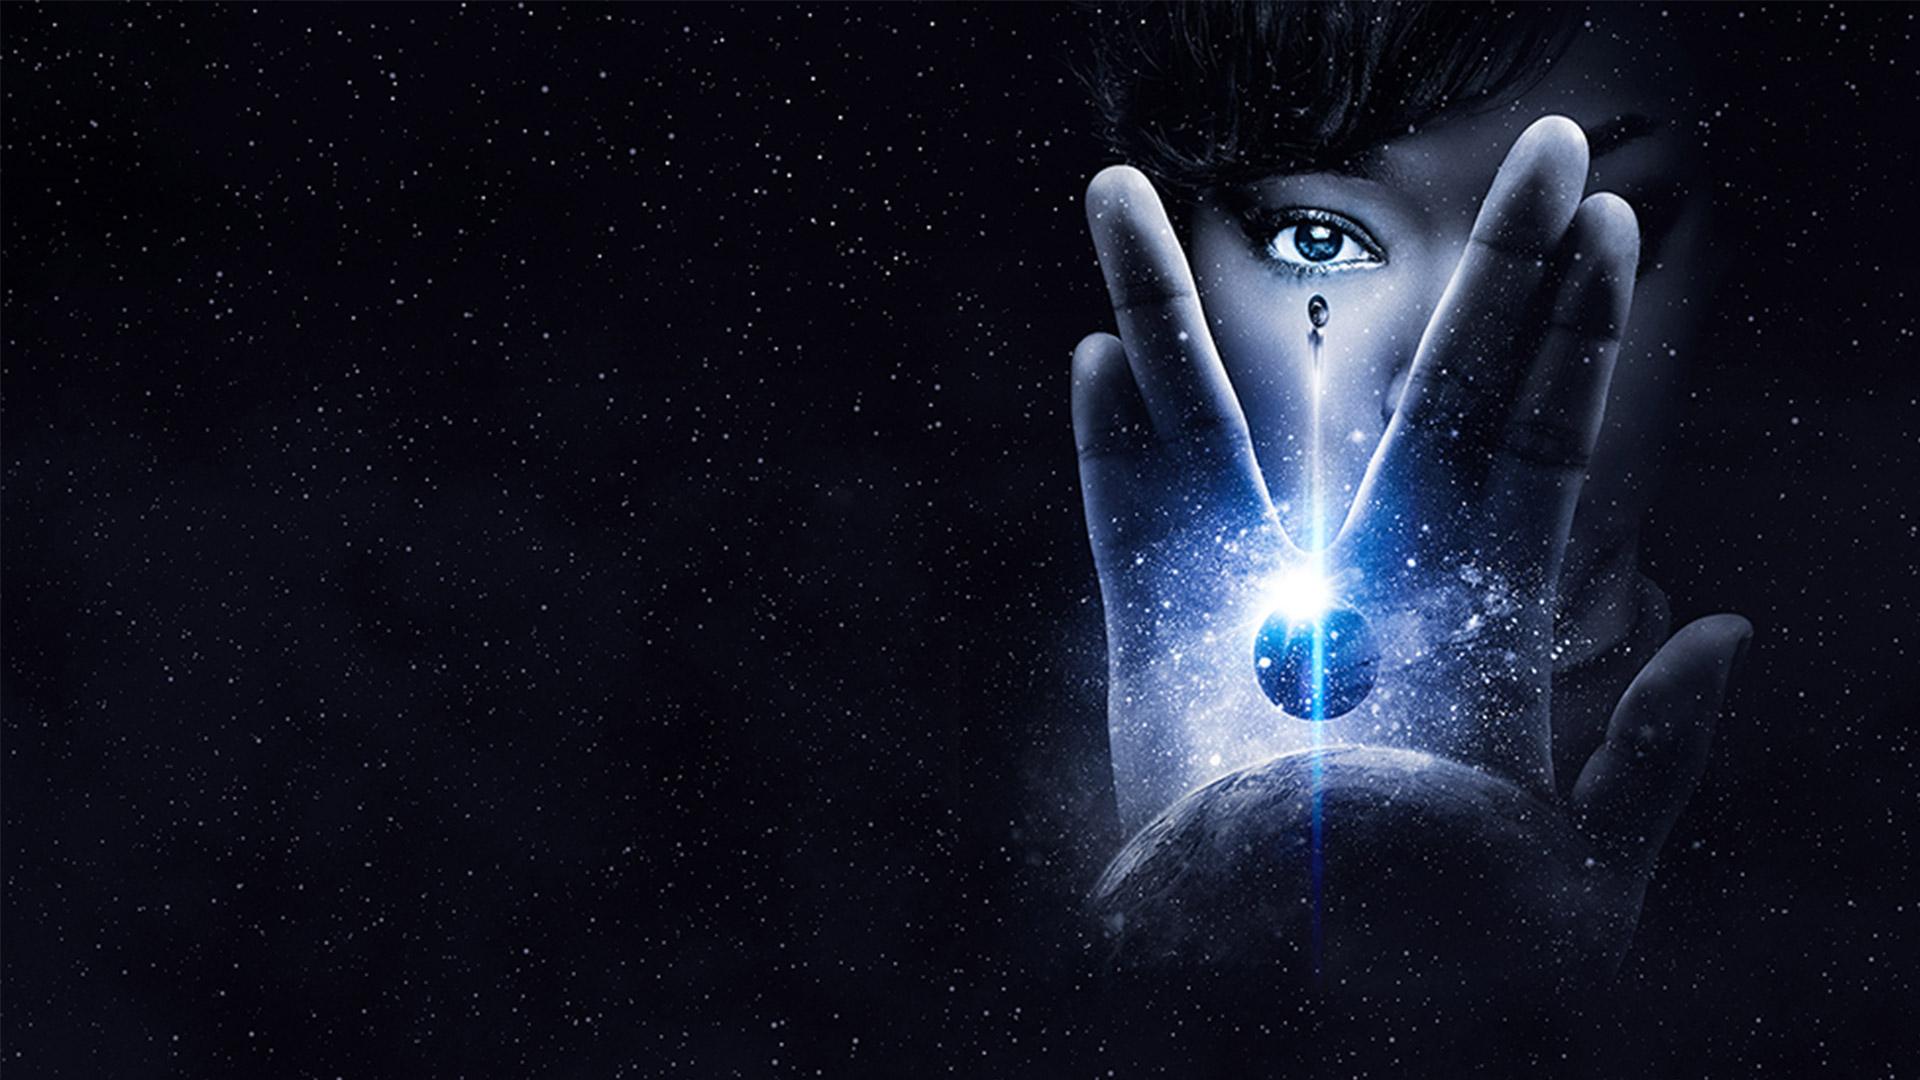 Amazoncom Watch Star Trek Discovery Season 1 Prime Video 1920x1080